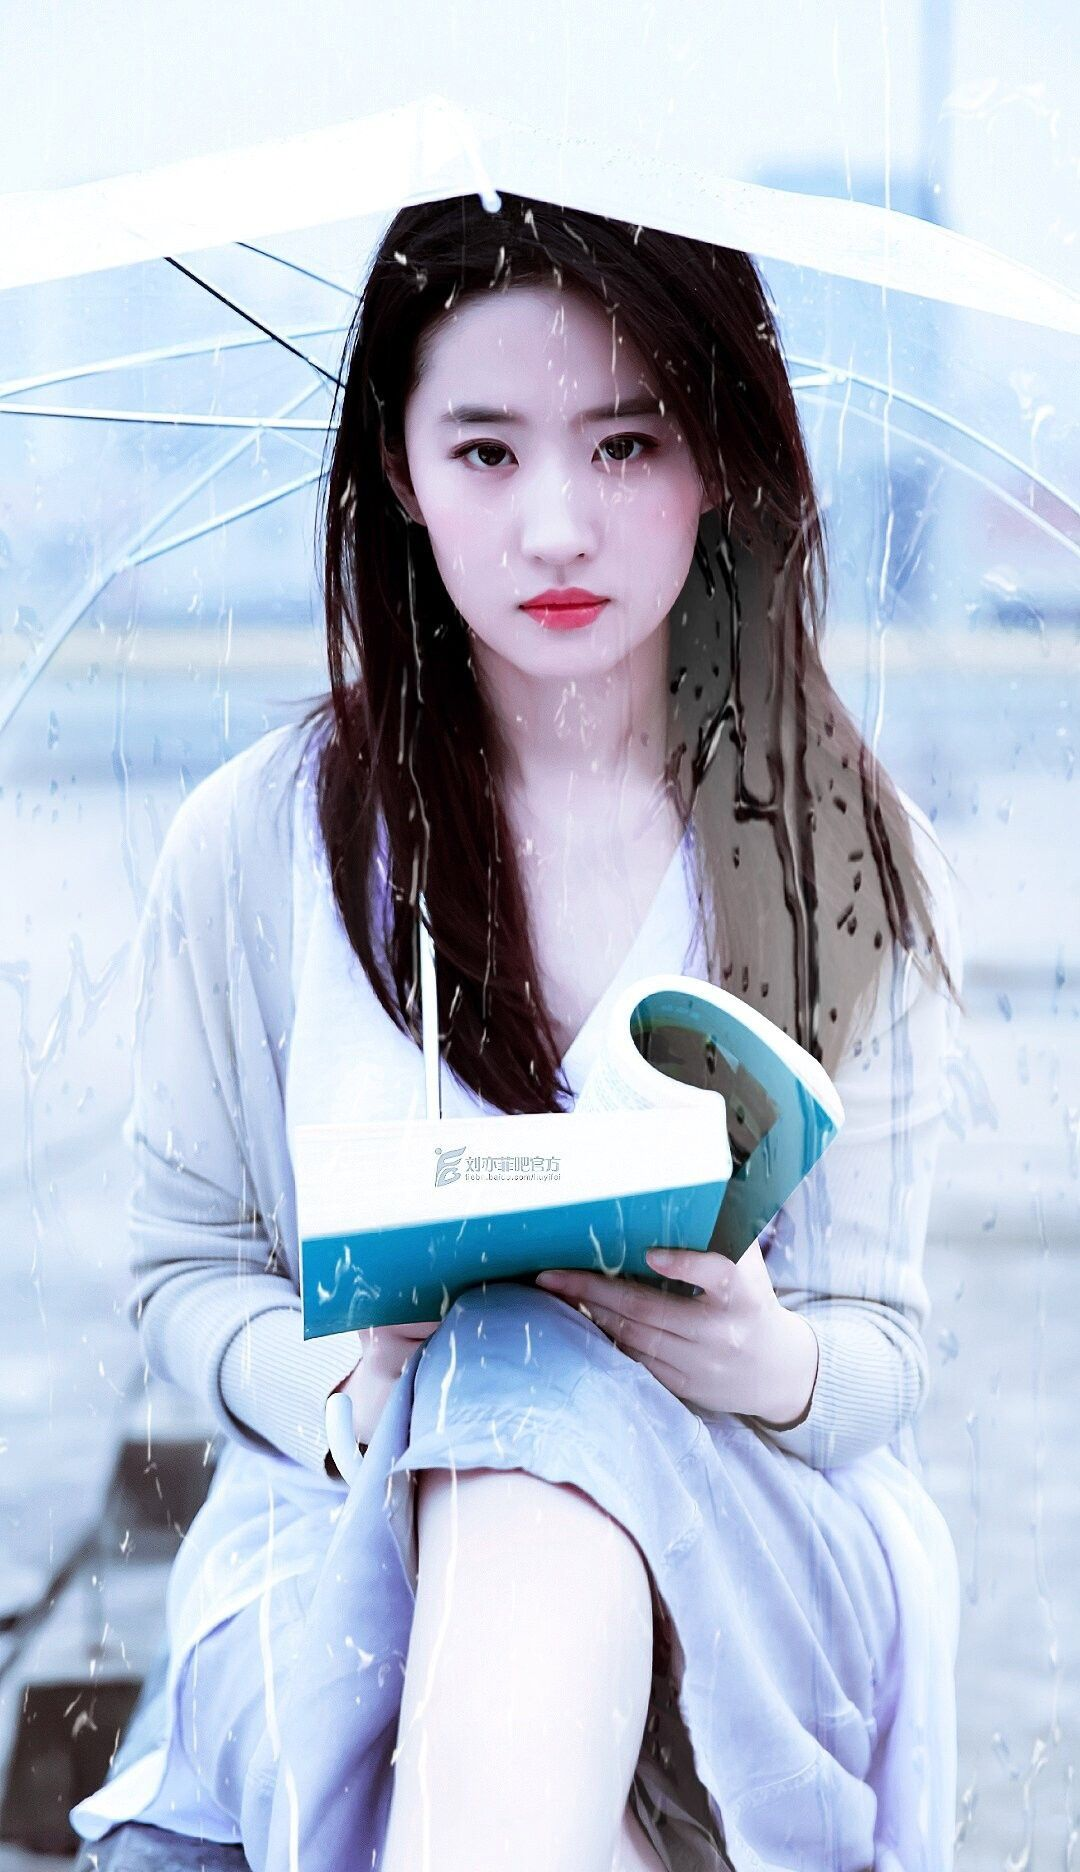 Ghim của Sk k2528 trên Liu Yifei(หลิวอี้เฟย) Nữ diễn